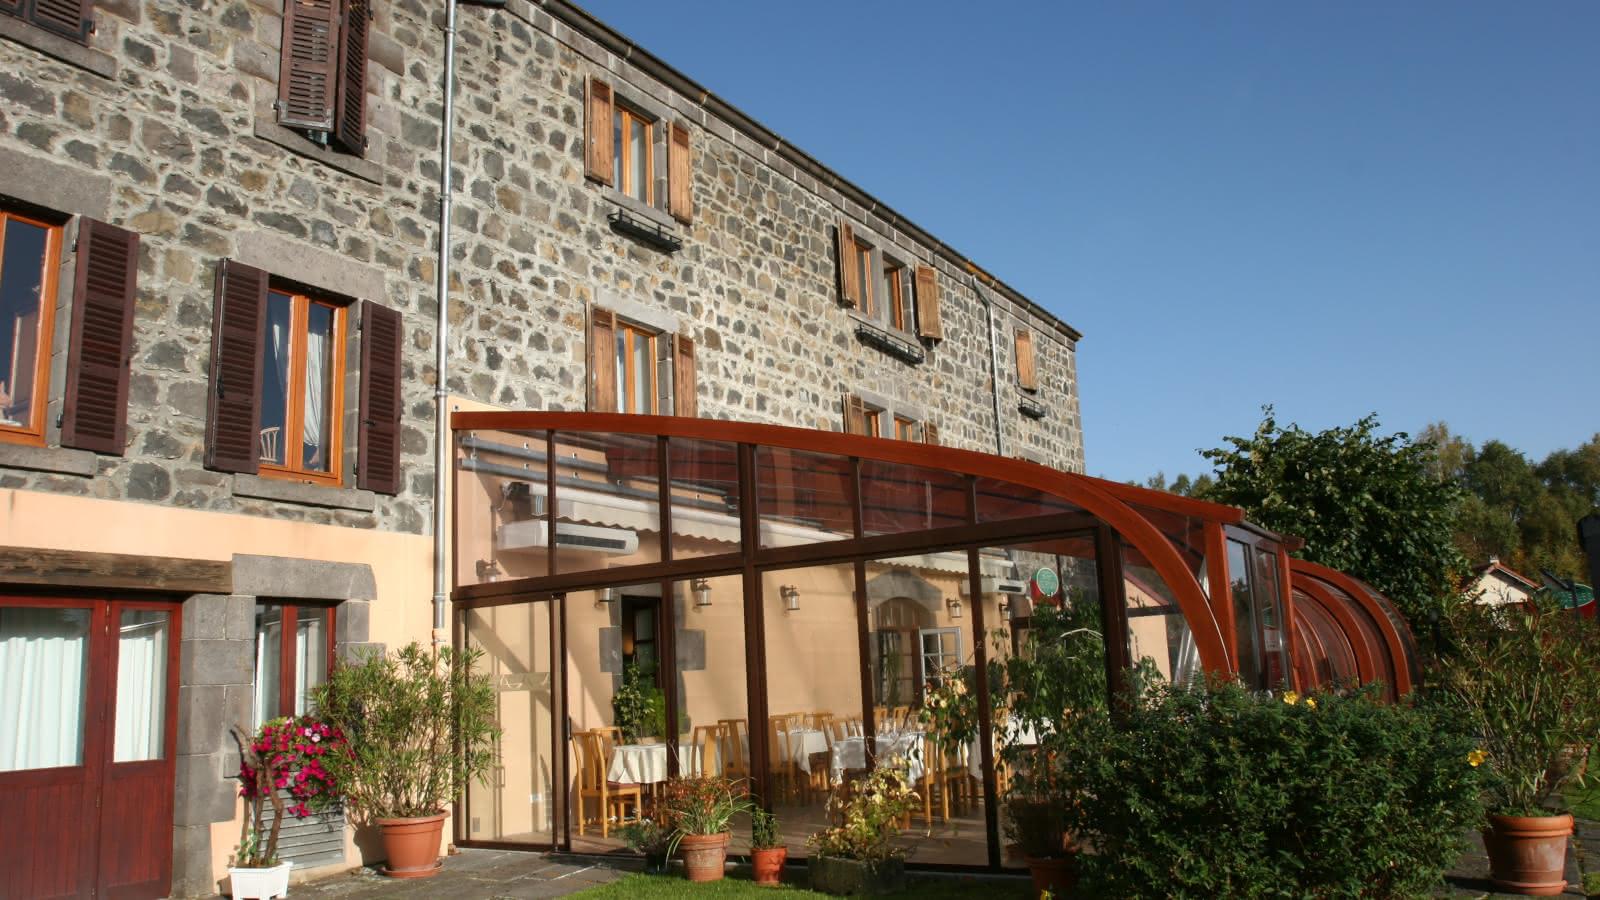 © Hôtel-Restaurant - Les Hirondelles